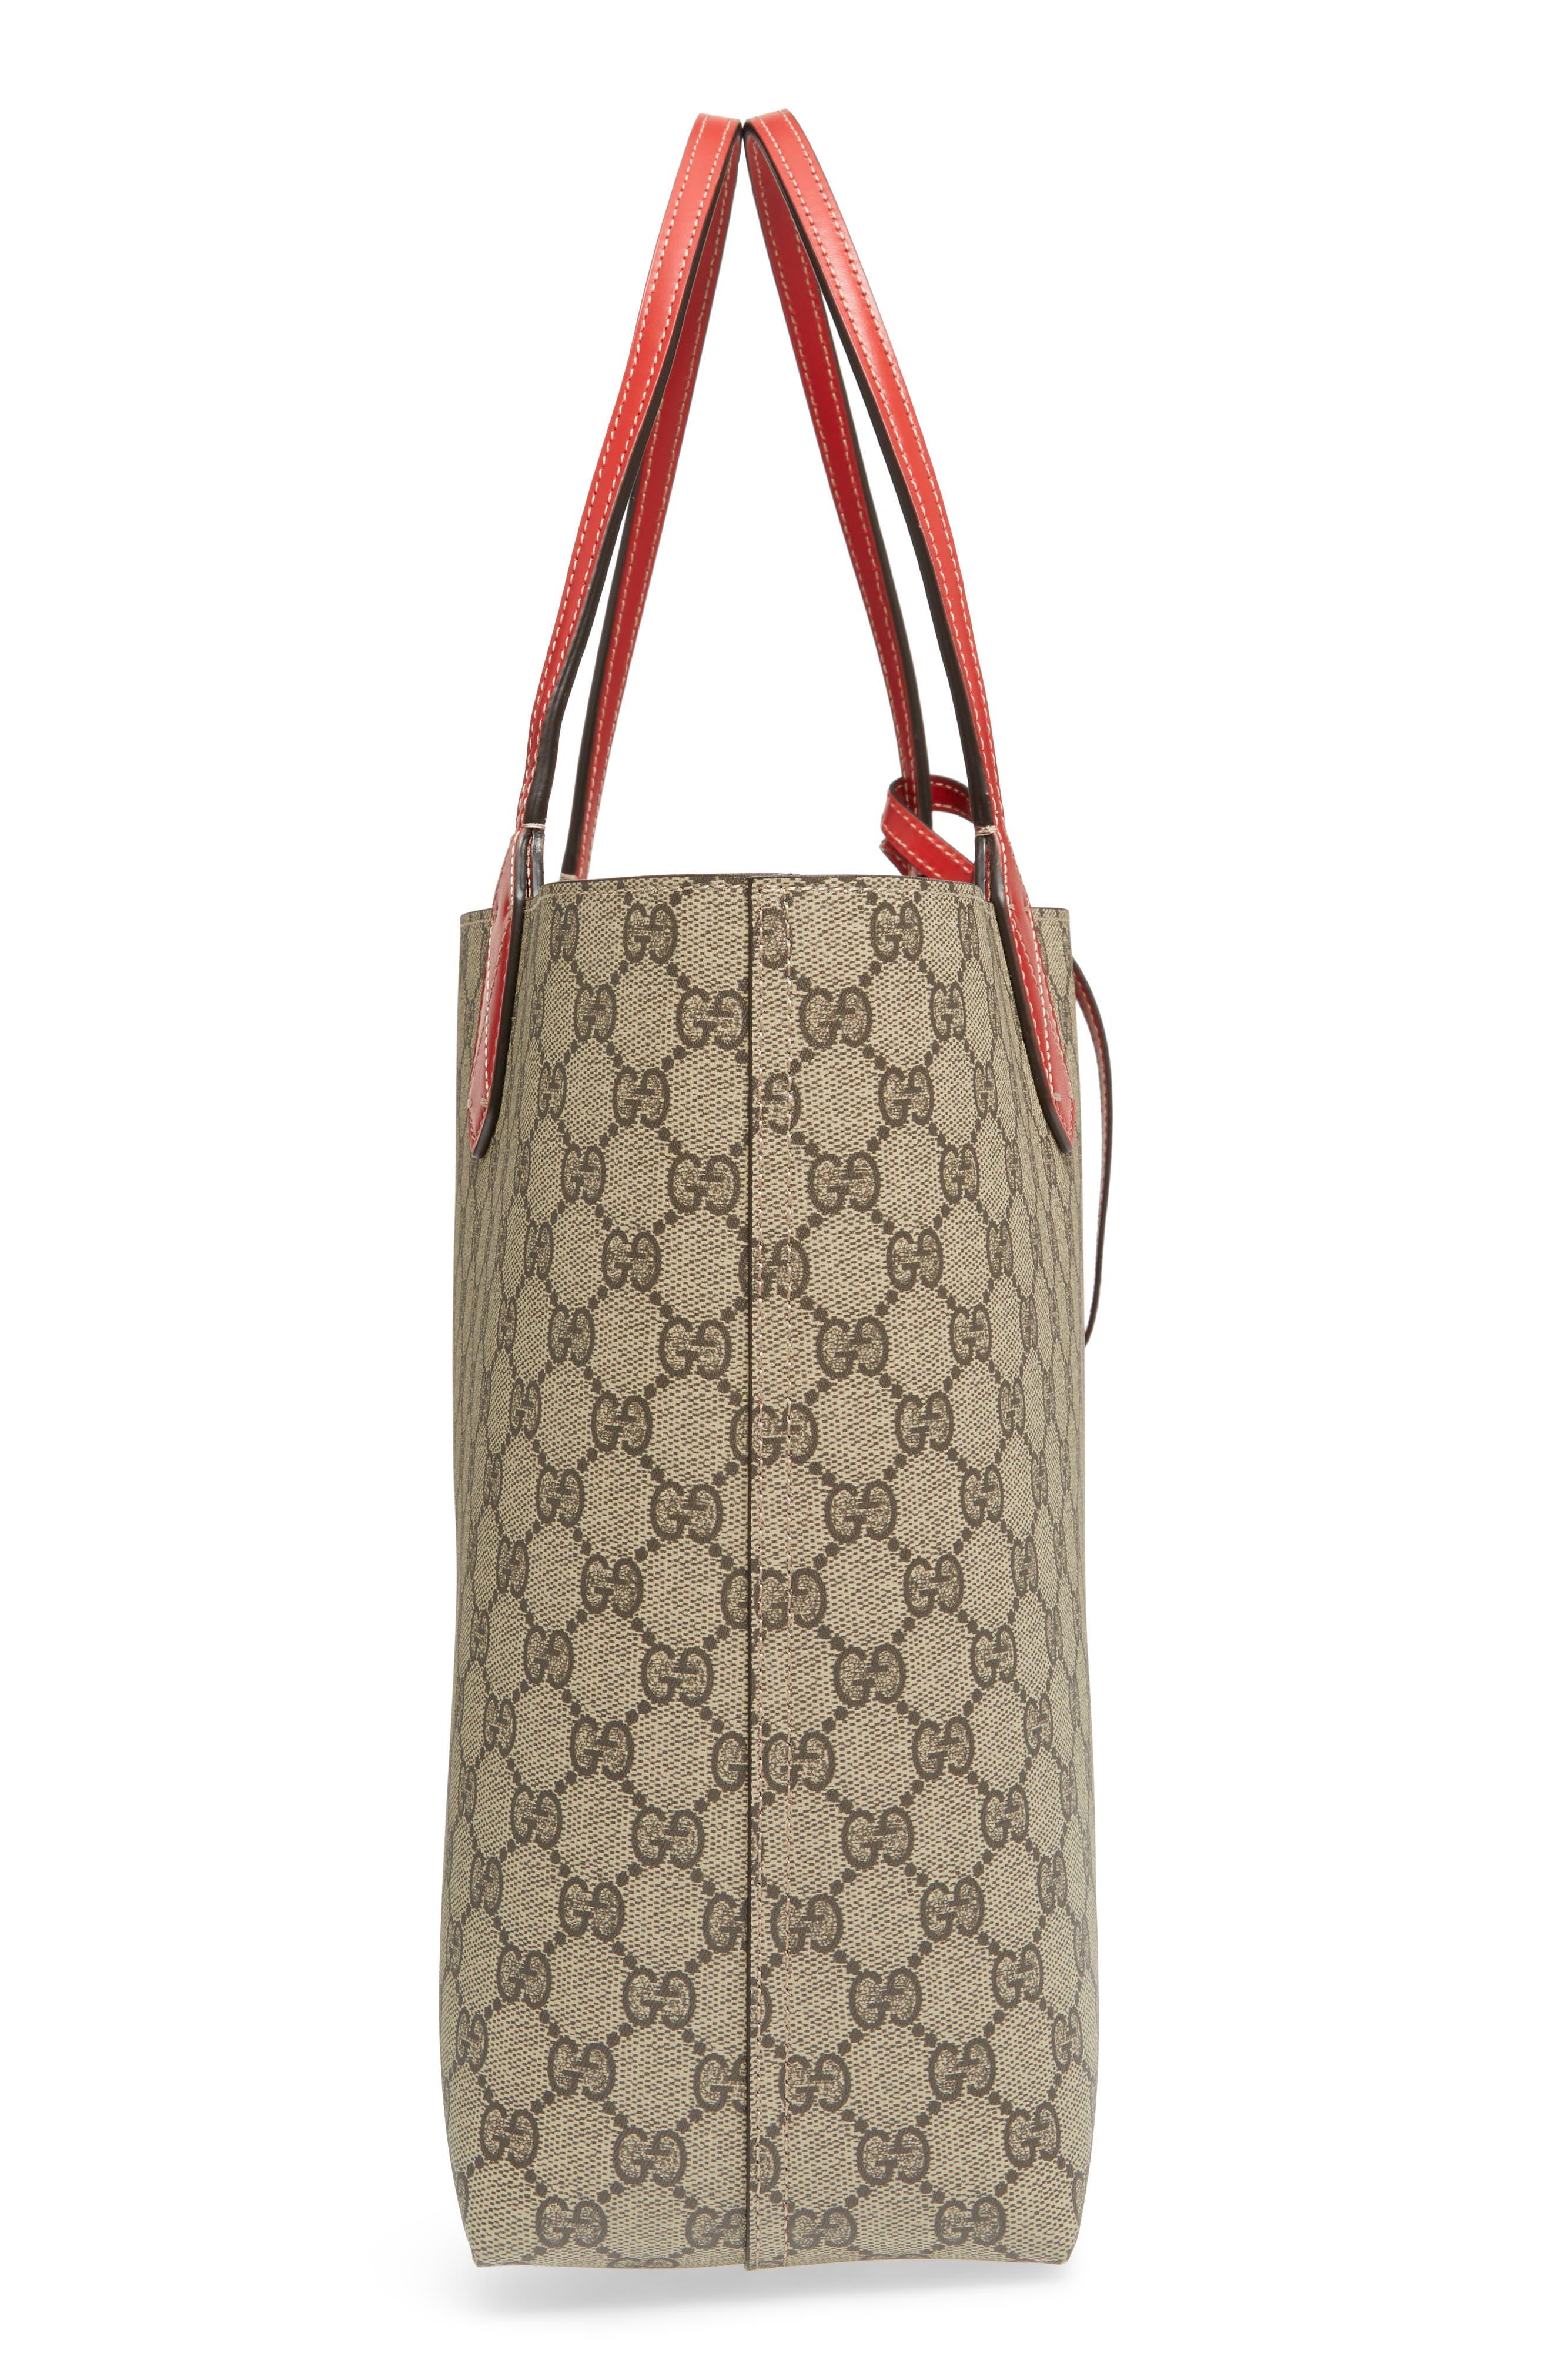 9dc898e14a5 Gucci Women s Totes Handbags